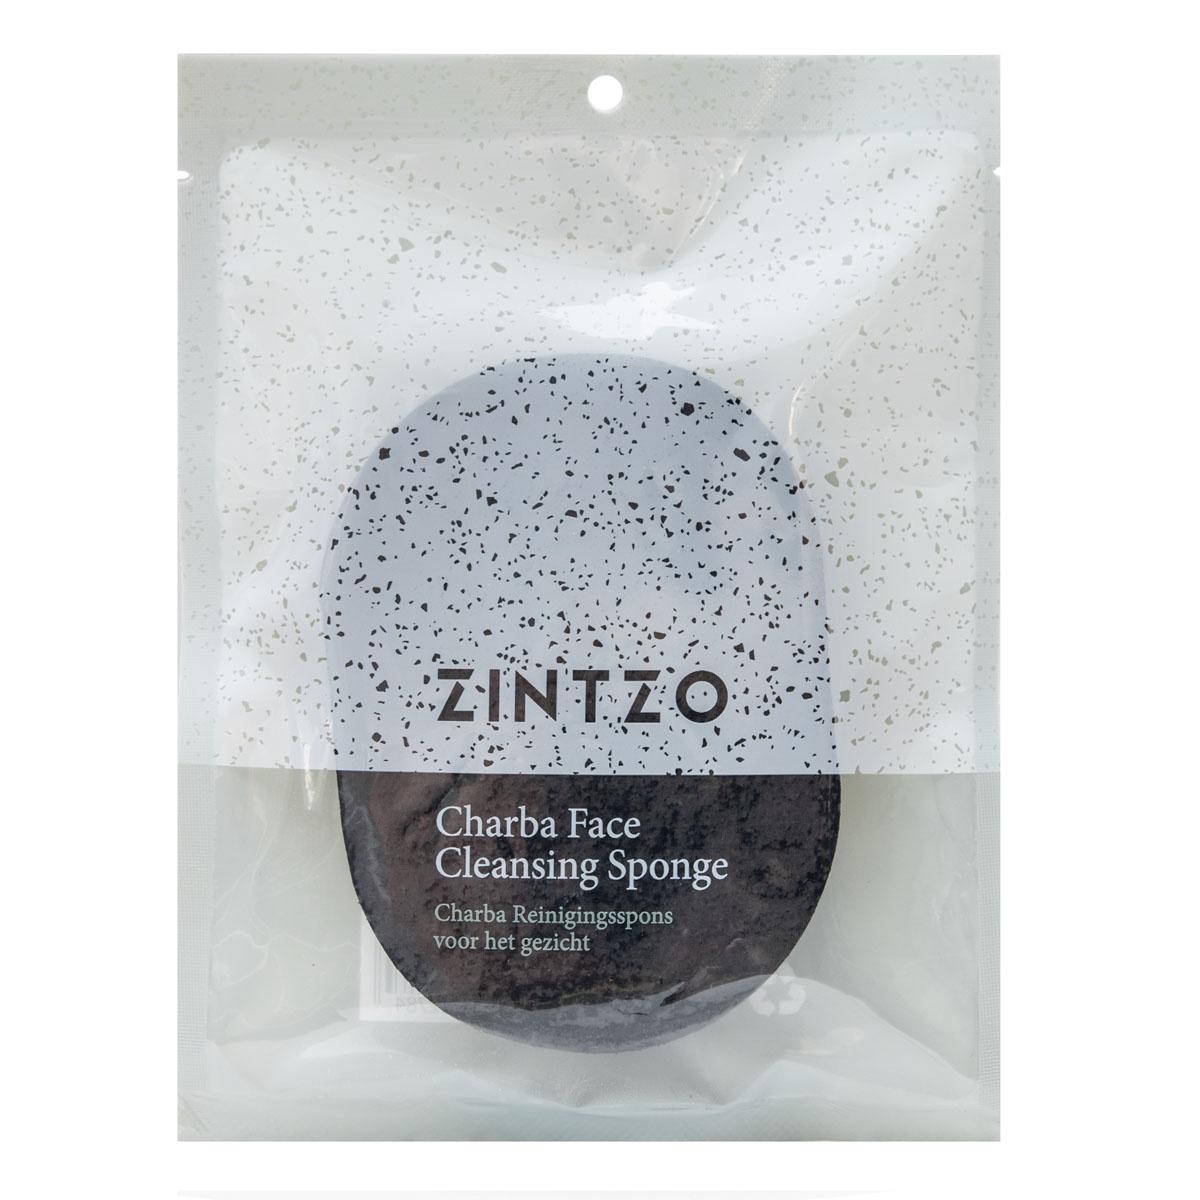 Zintzo-charba-reinigingsspons